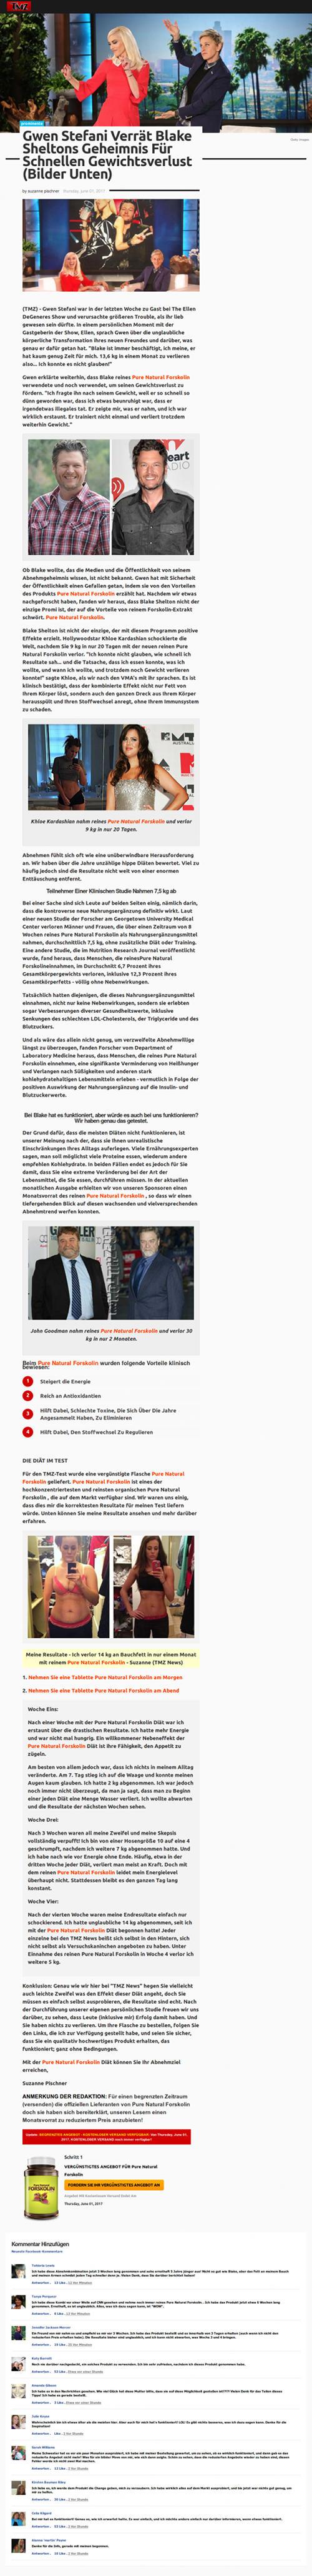 Screenshot der betrügerischen Website